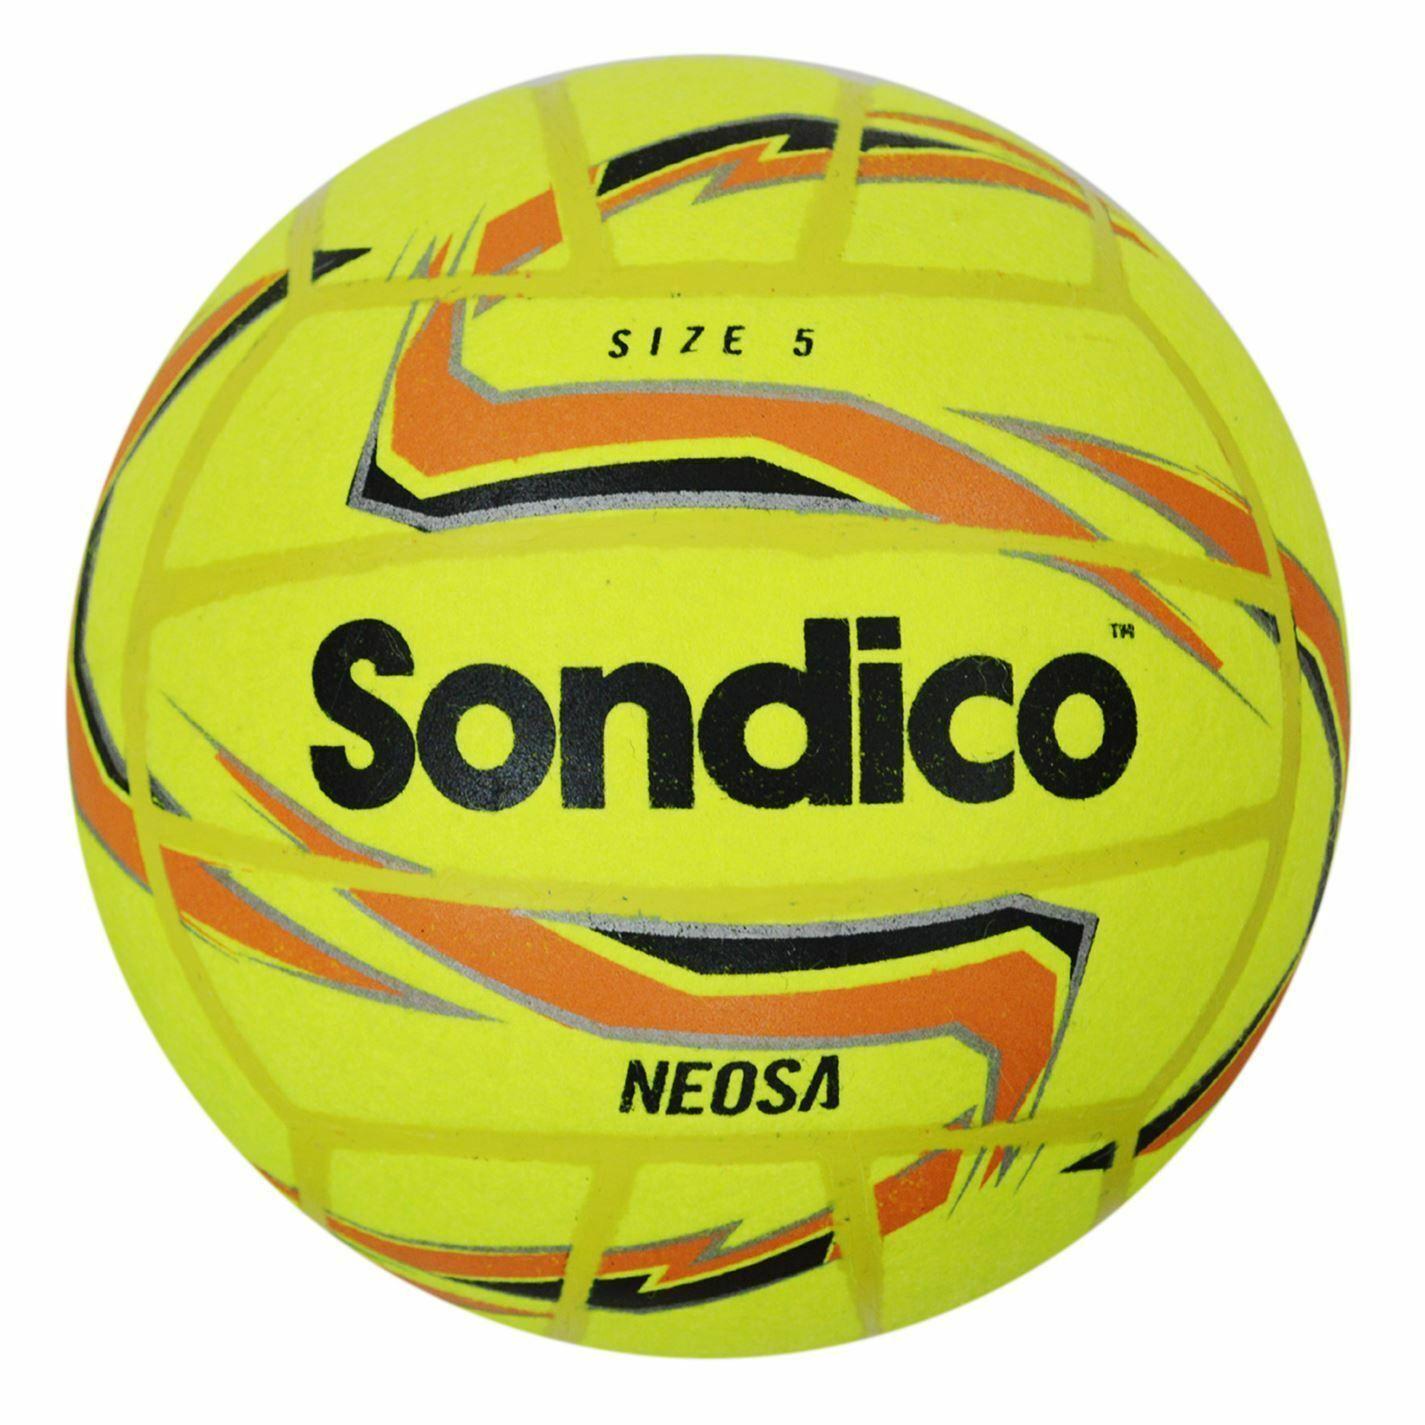 Sondico Neosa Hallenfußball Gelb Fußball Fußball Fußball 4e59a1